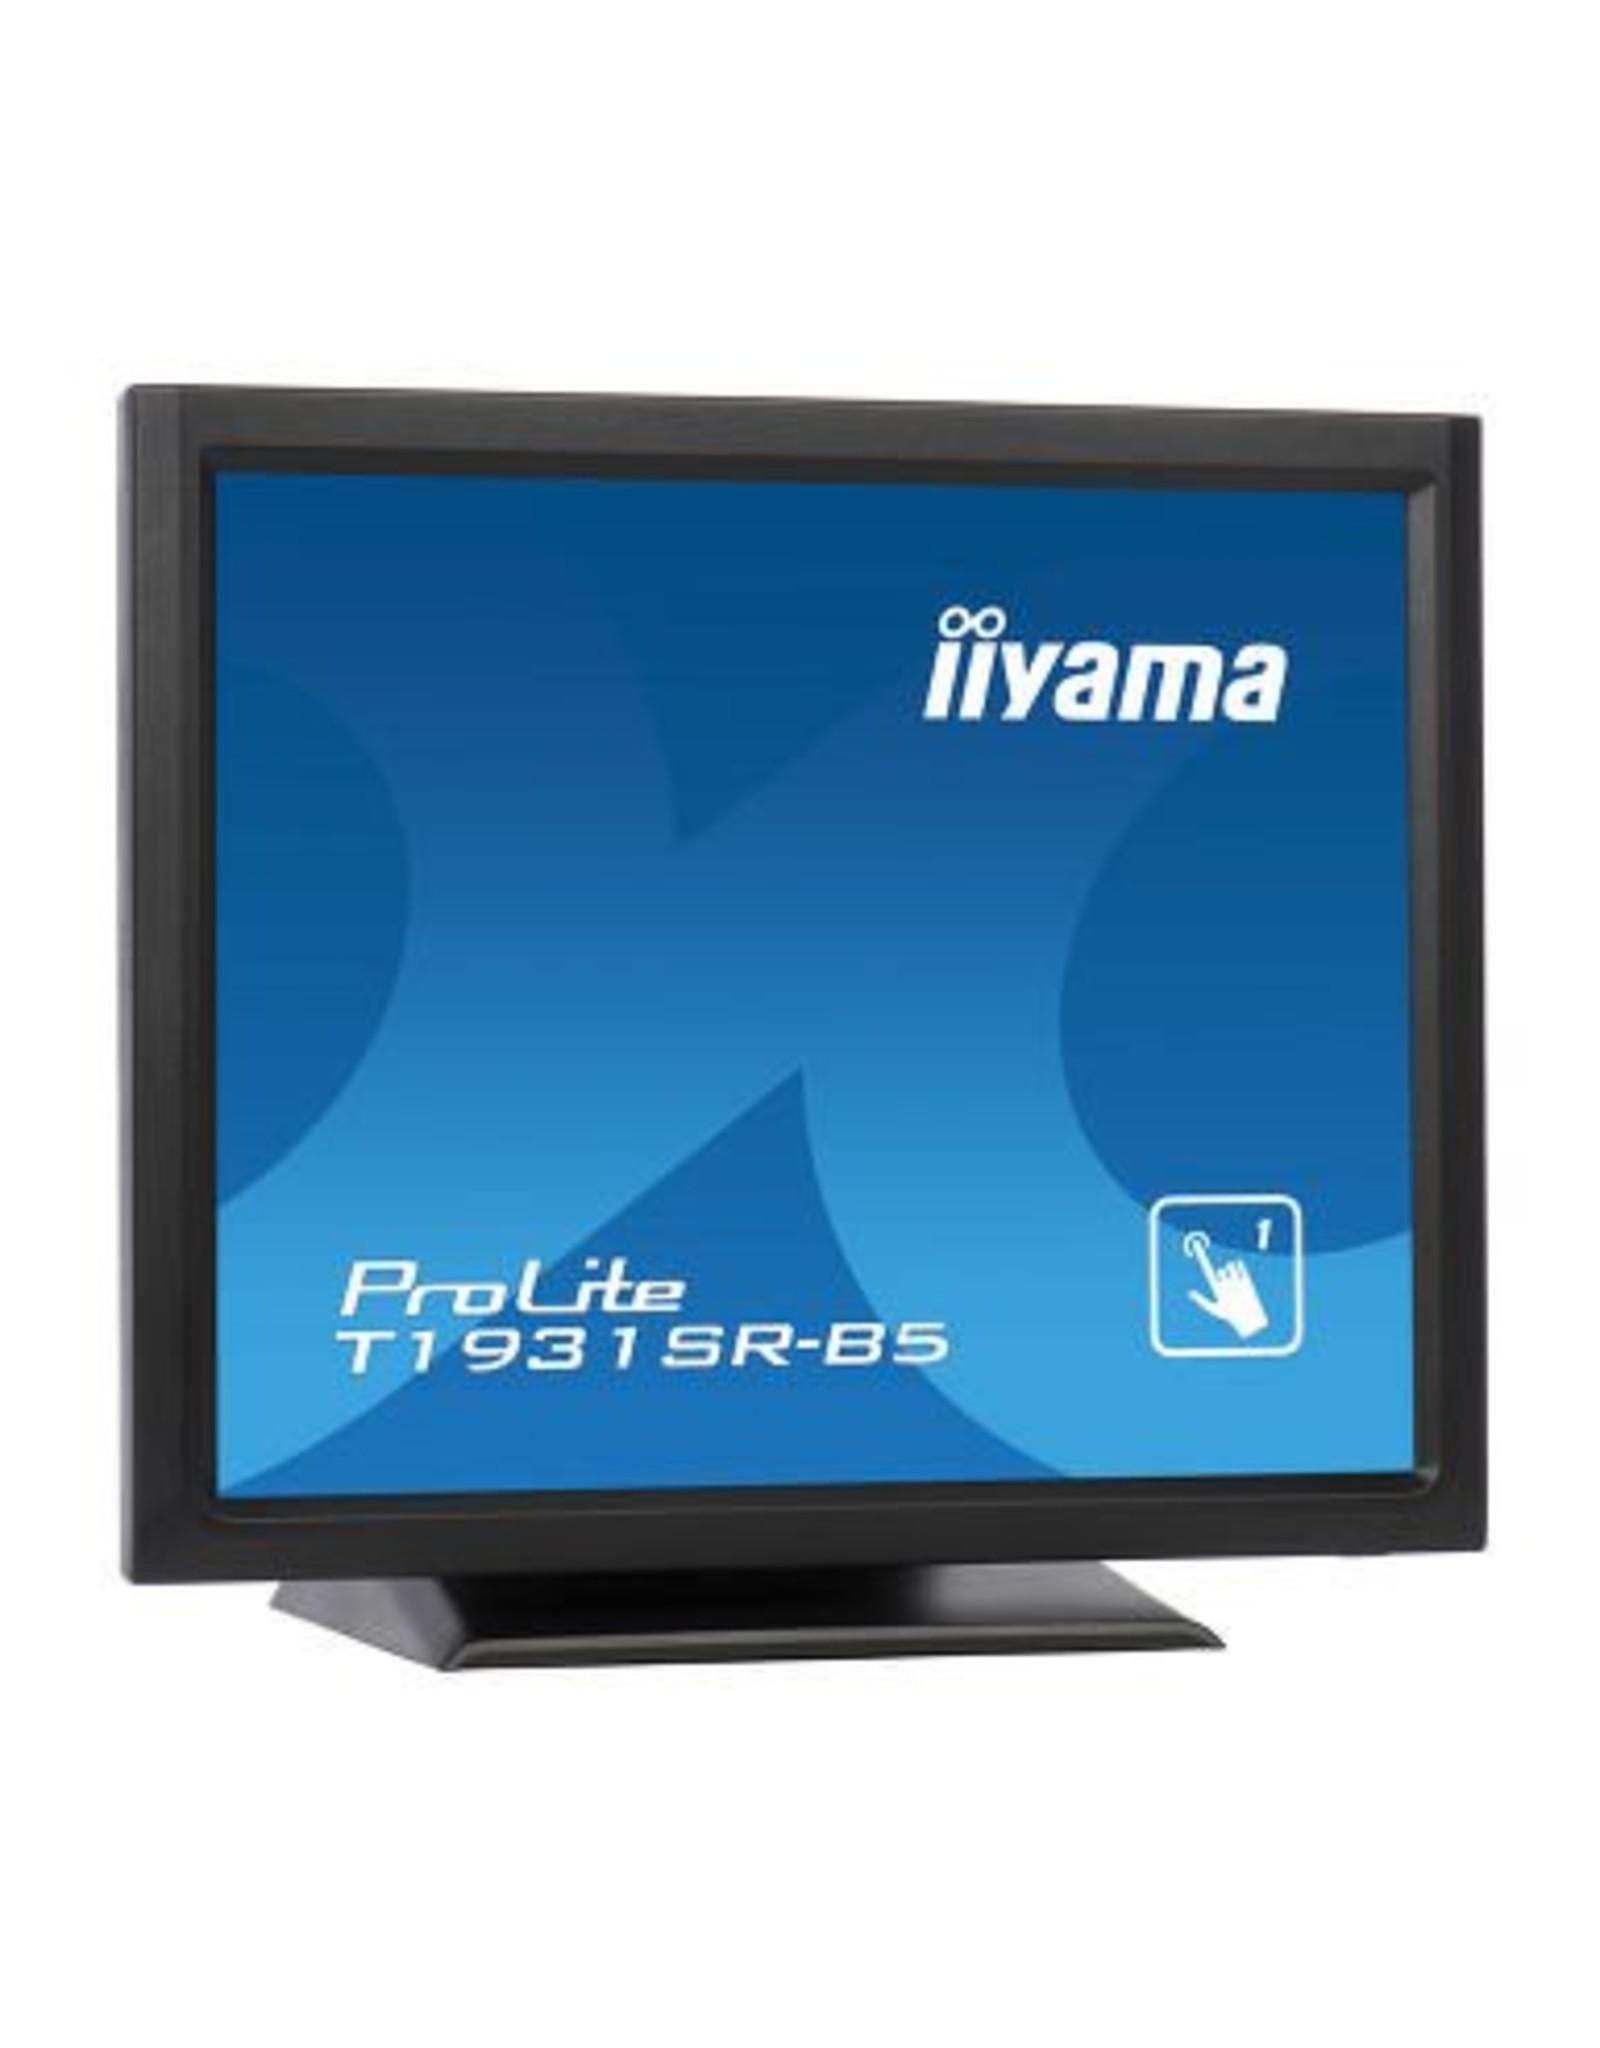 iiyama iiyama ProLite T1931SR-B5 19